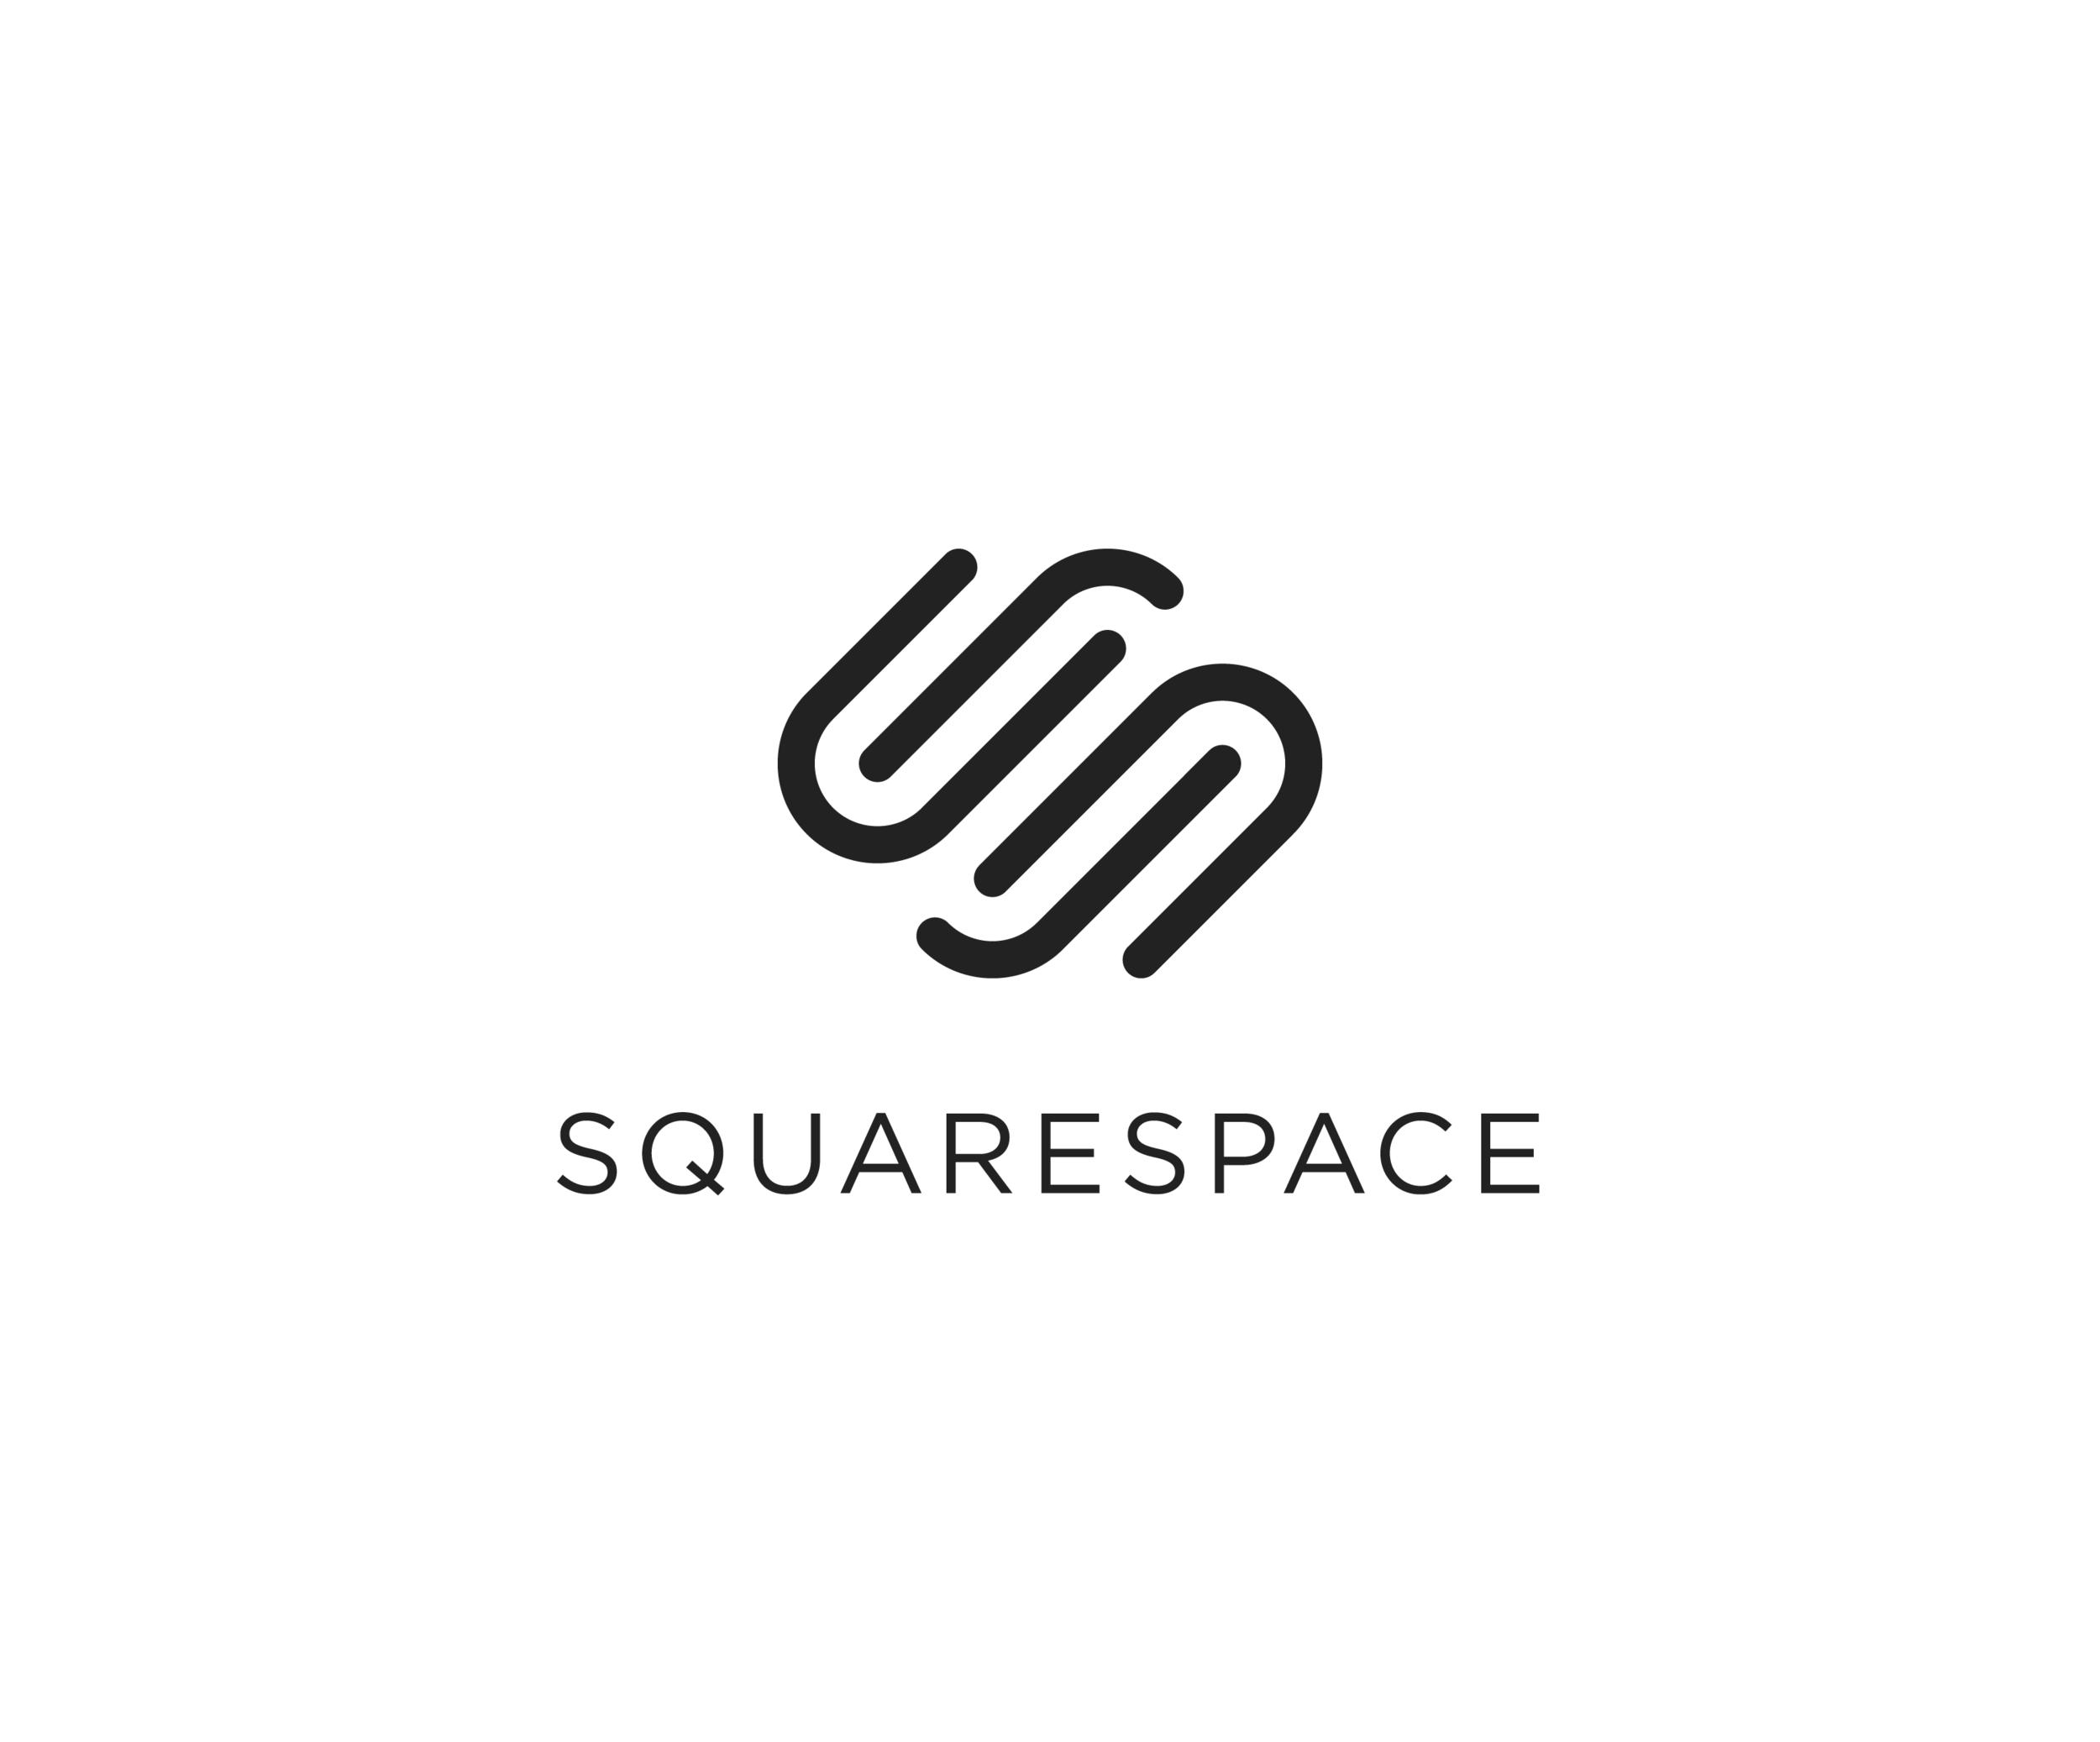 squarespace-logo-stacked-black.png